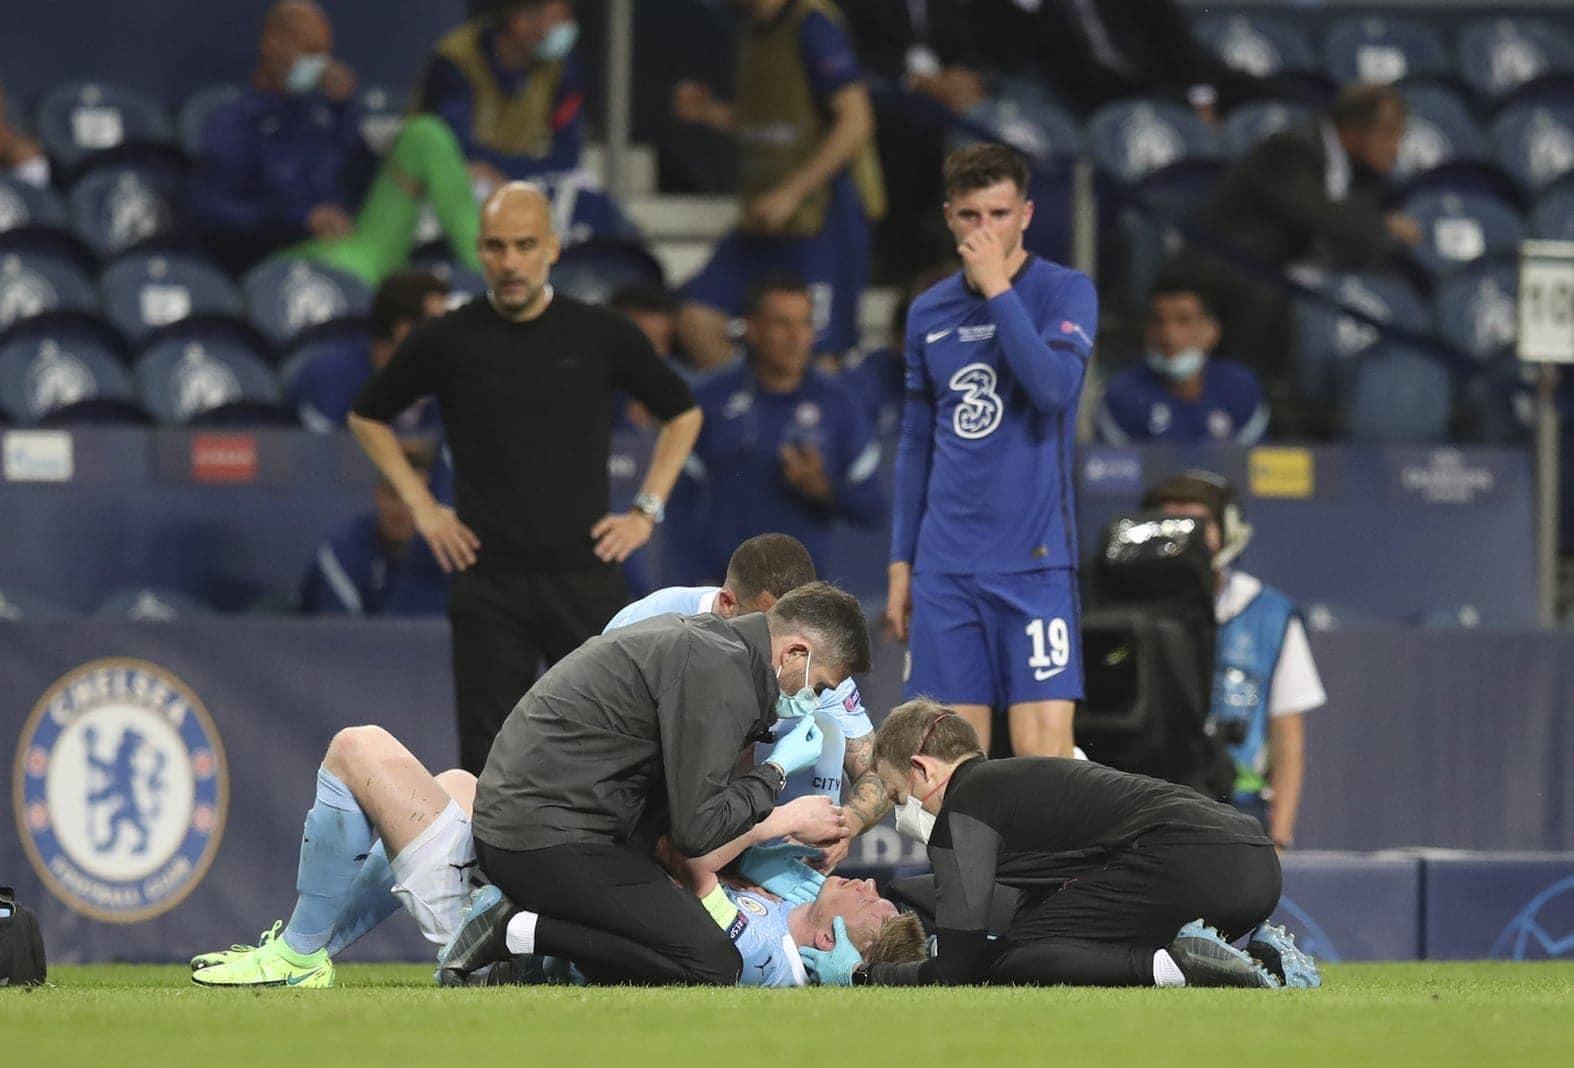 Manchester City - FC Chelsea De Bruyne am Boden